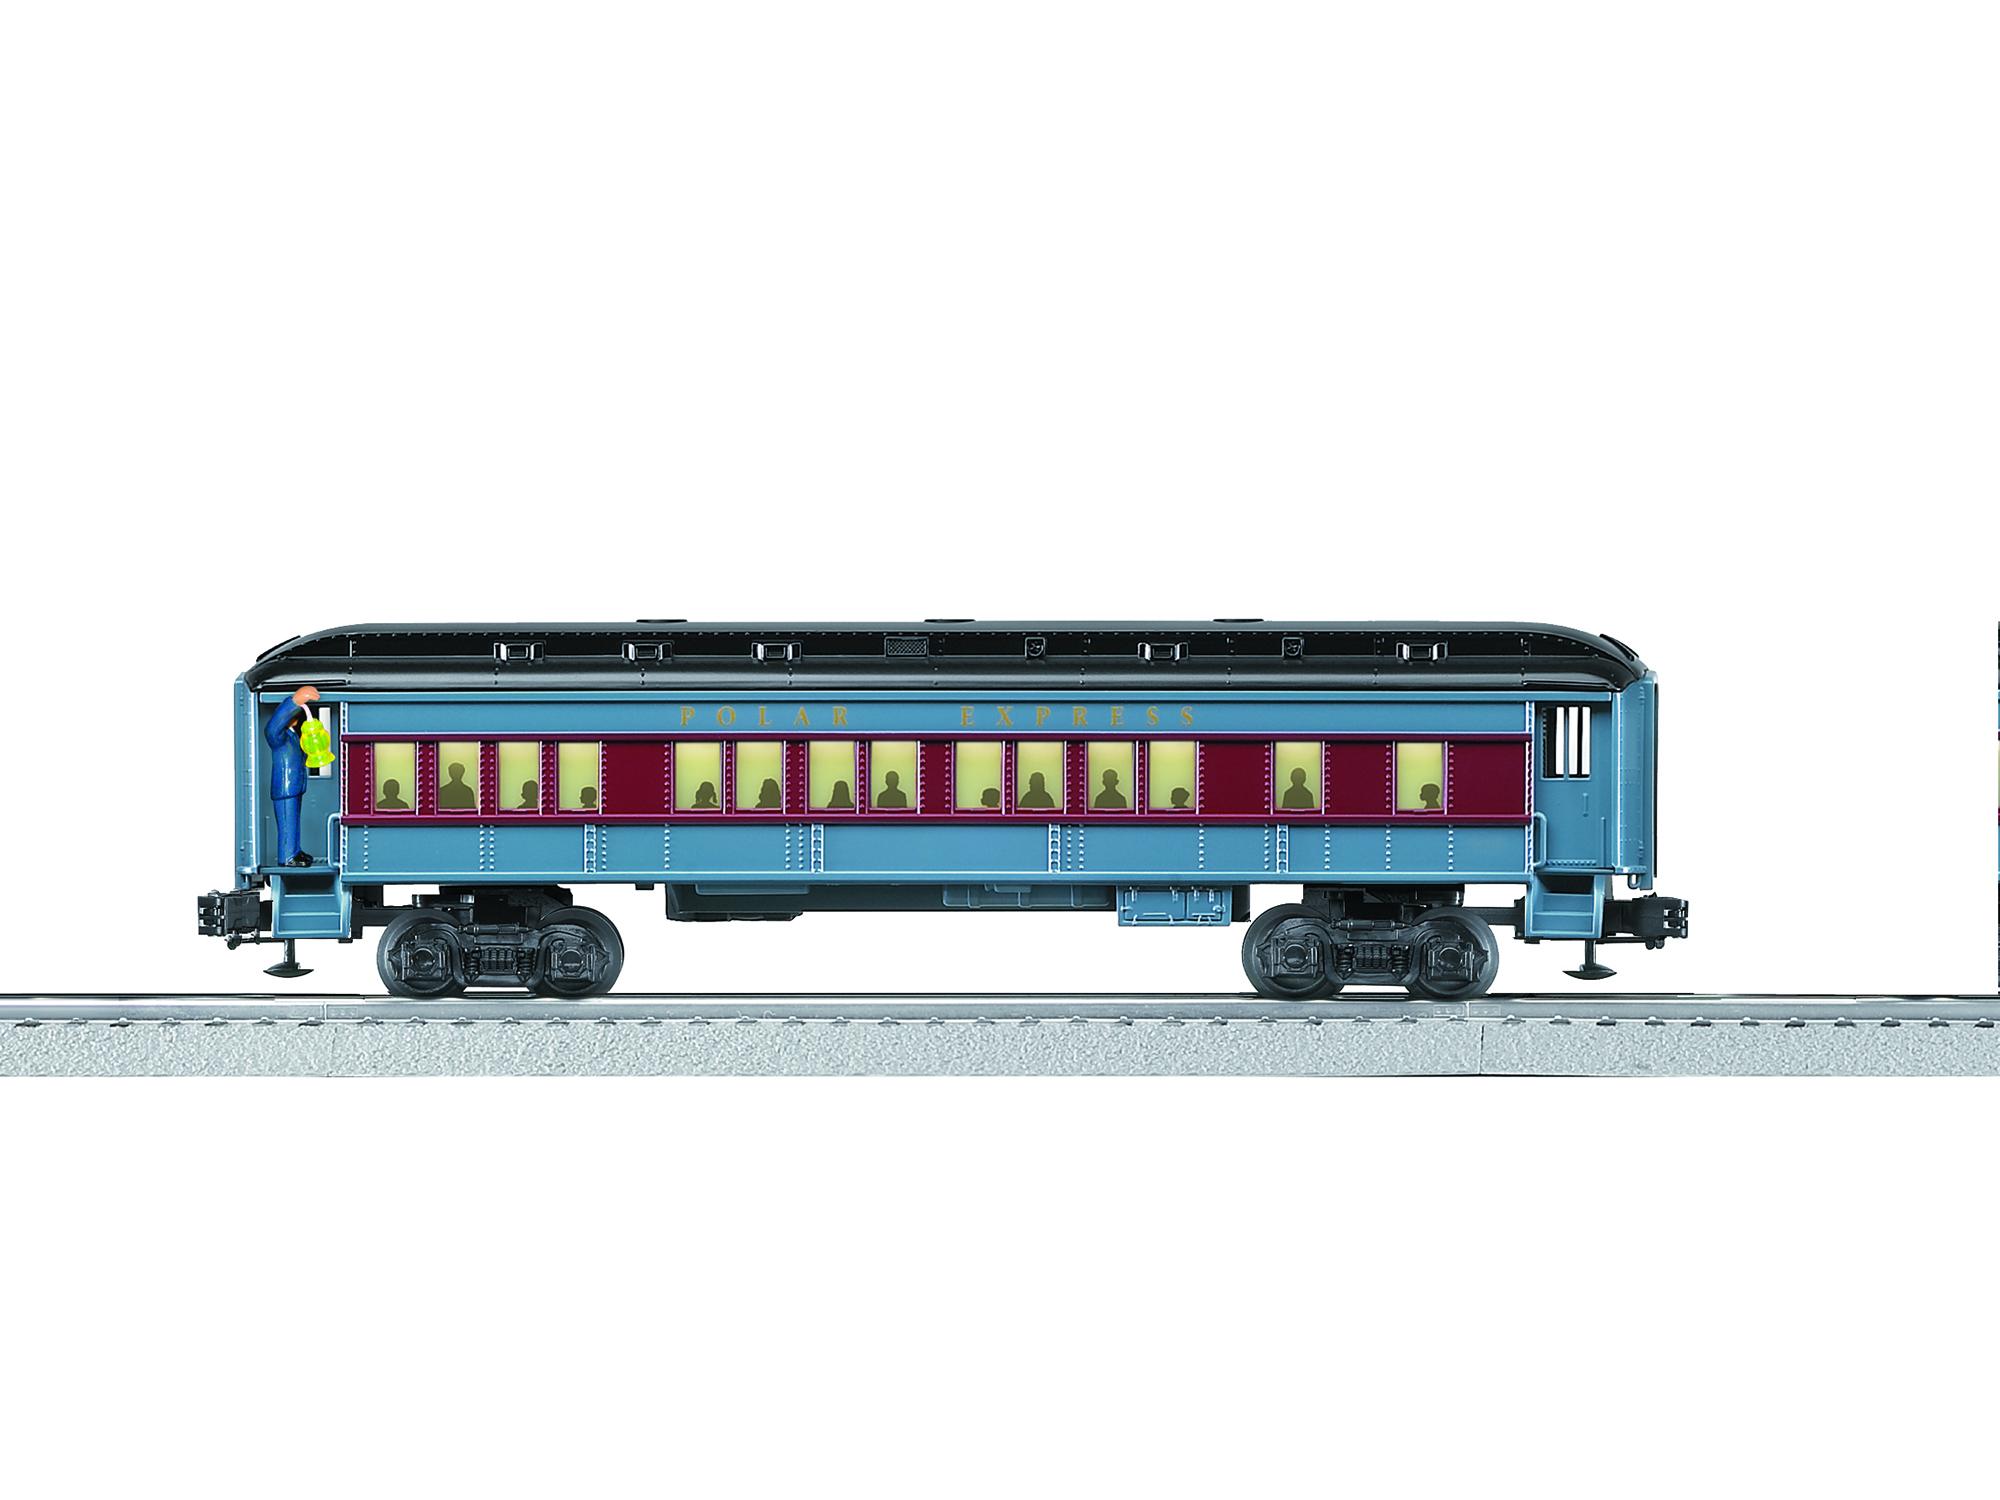 LNL683437 Lionel O-27 Announcement Car, Polar Express